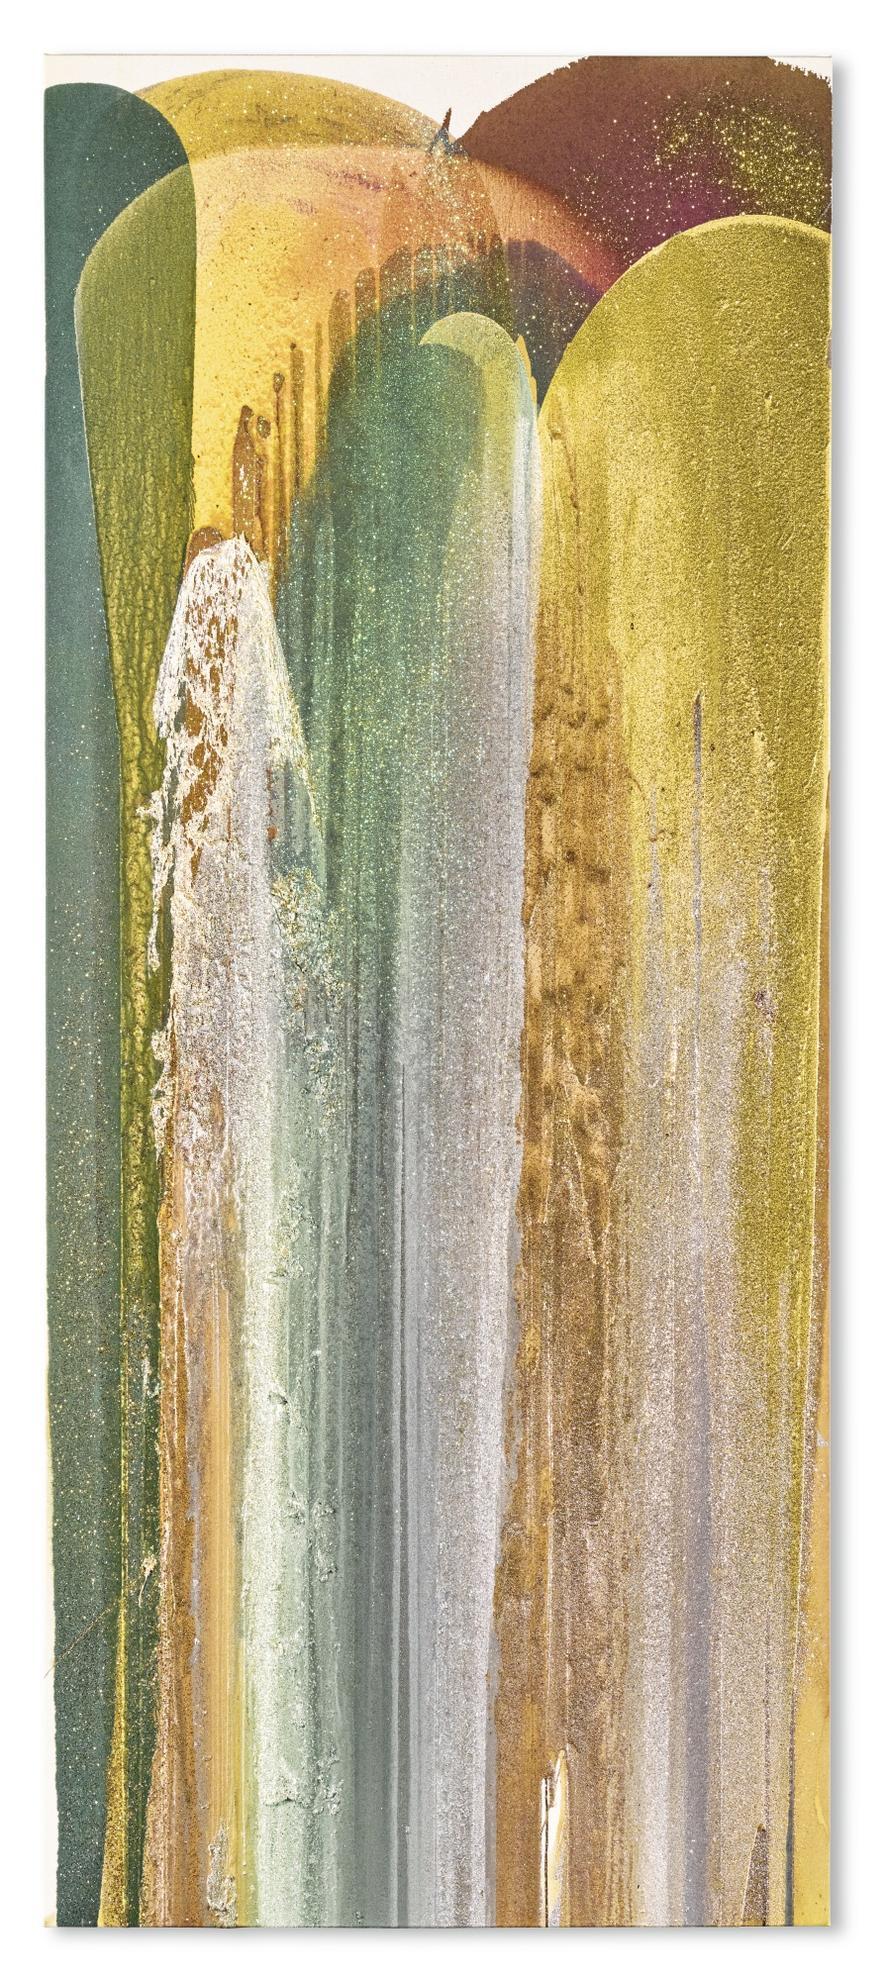 John Armleder-Leucanthenum Vulgare-2003